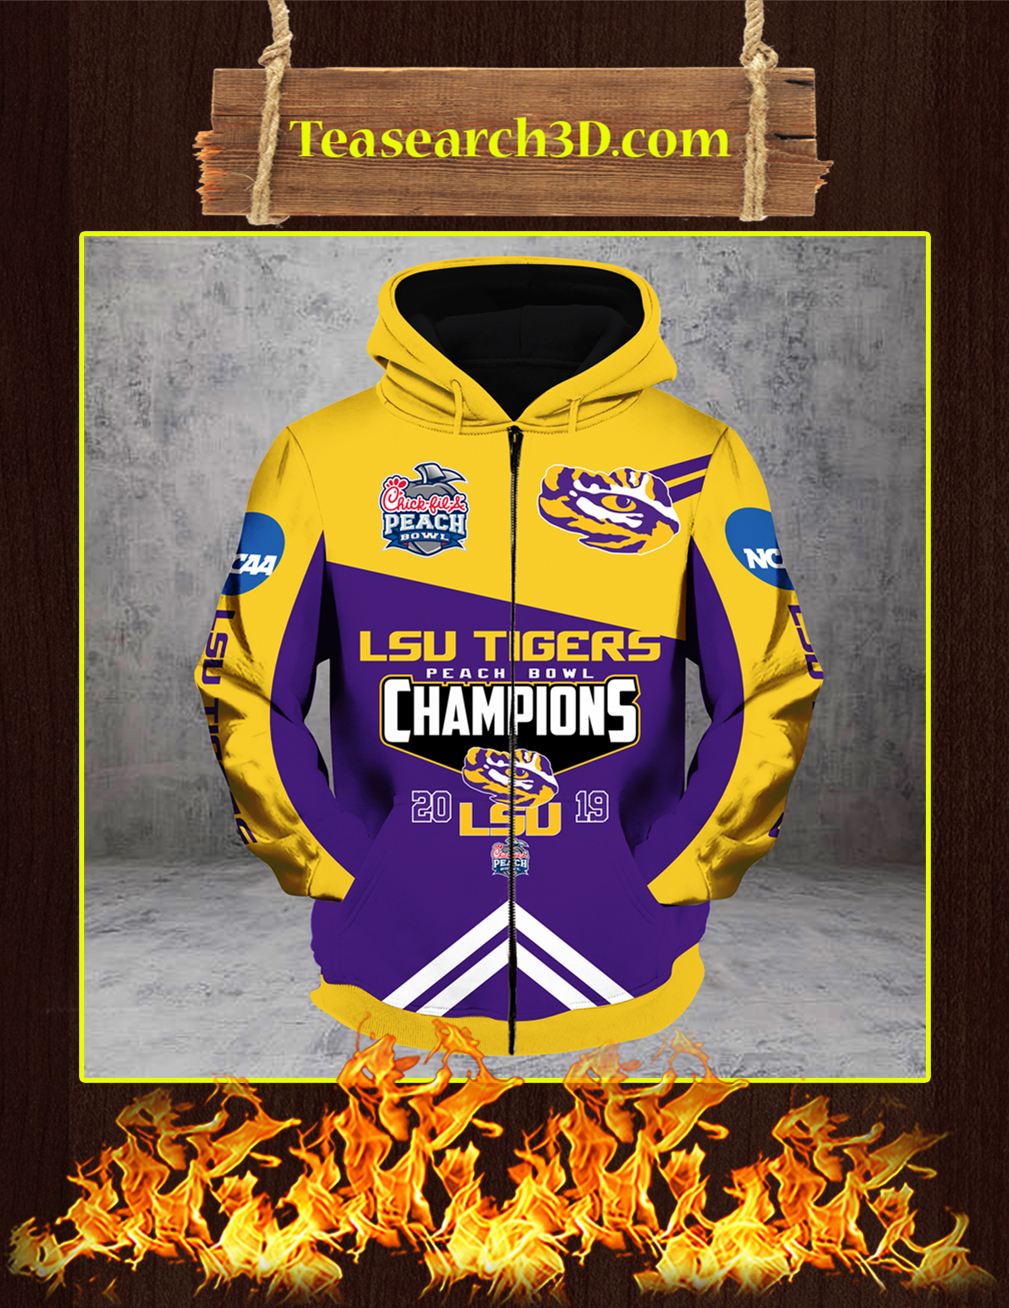 LSU Tigers Peach Bowl Champions 2019 3D Zip Hoodie